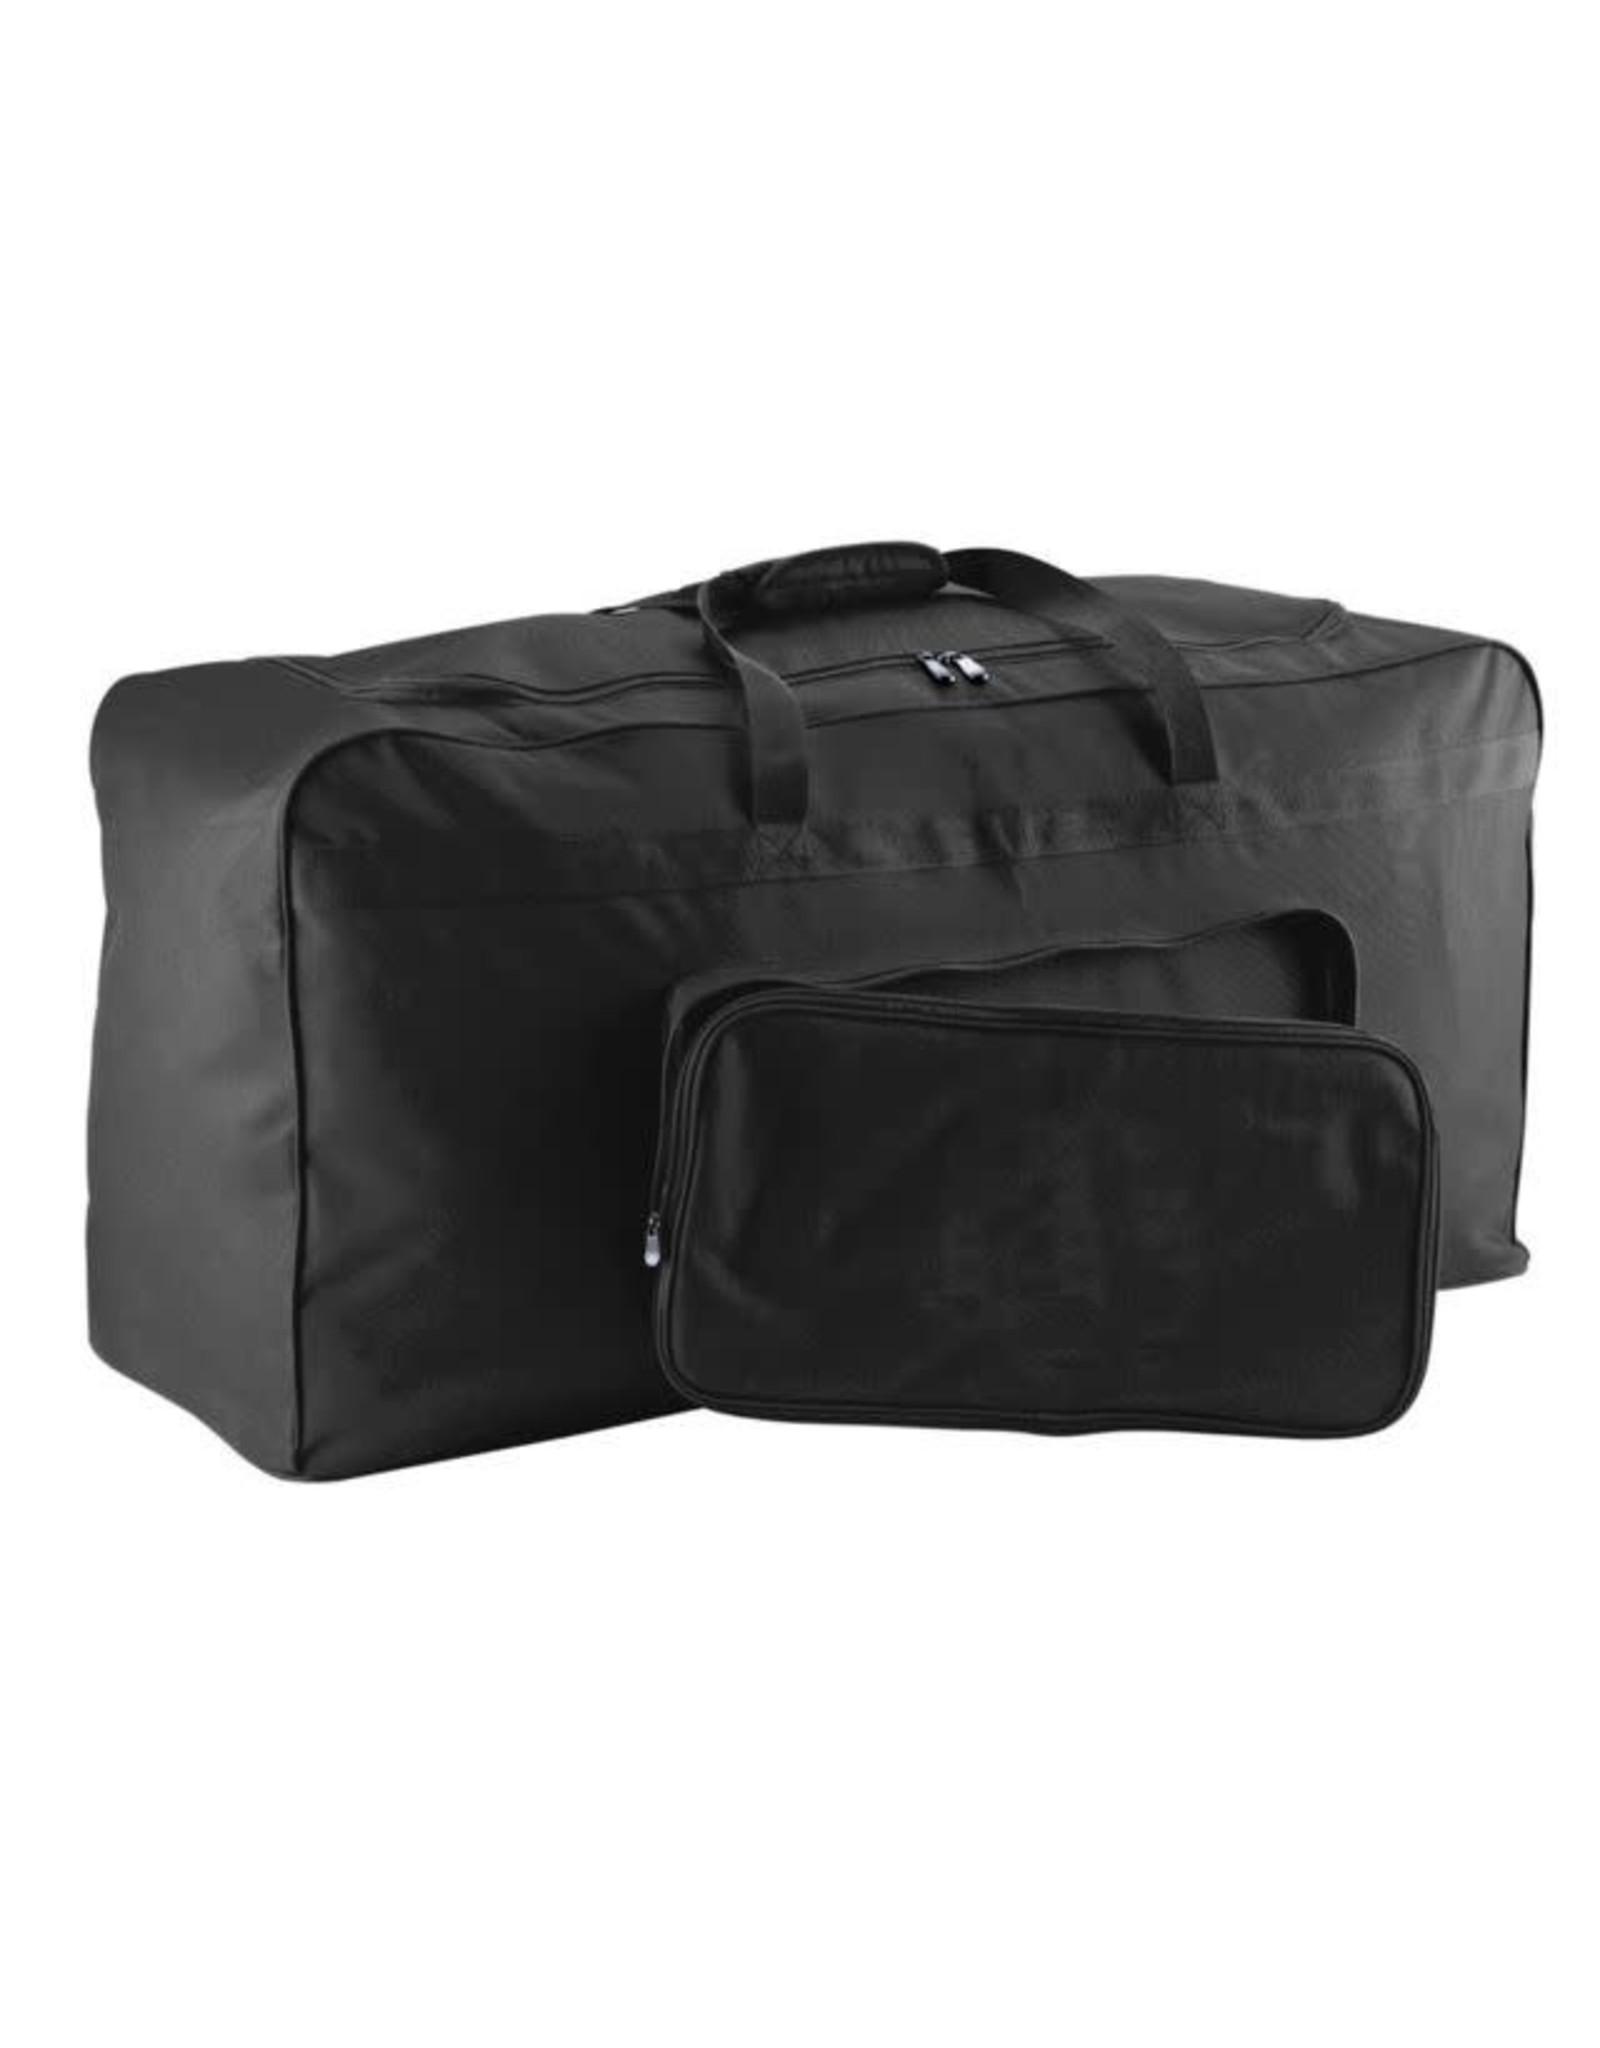 NON-UNIFORM Large Equipment Bag, Duffle